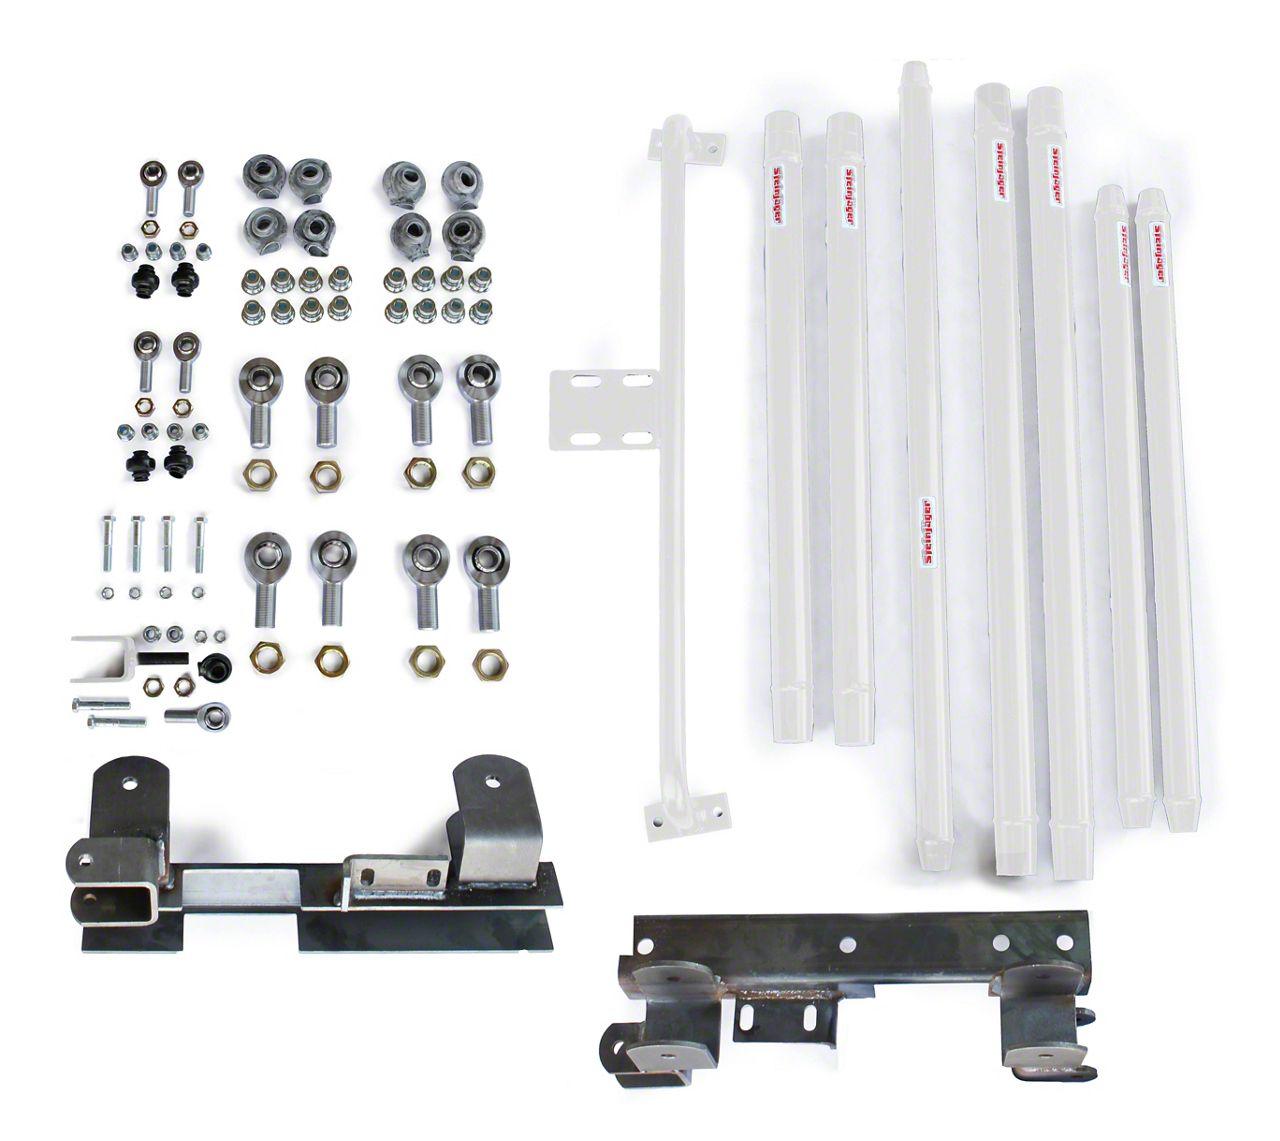 Steinjager DOM Tube Long Arm Travel kit for 2-6 in. Lift - Cloud White (97-06 Jeep Wrangler TJ)